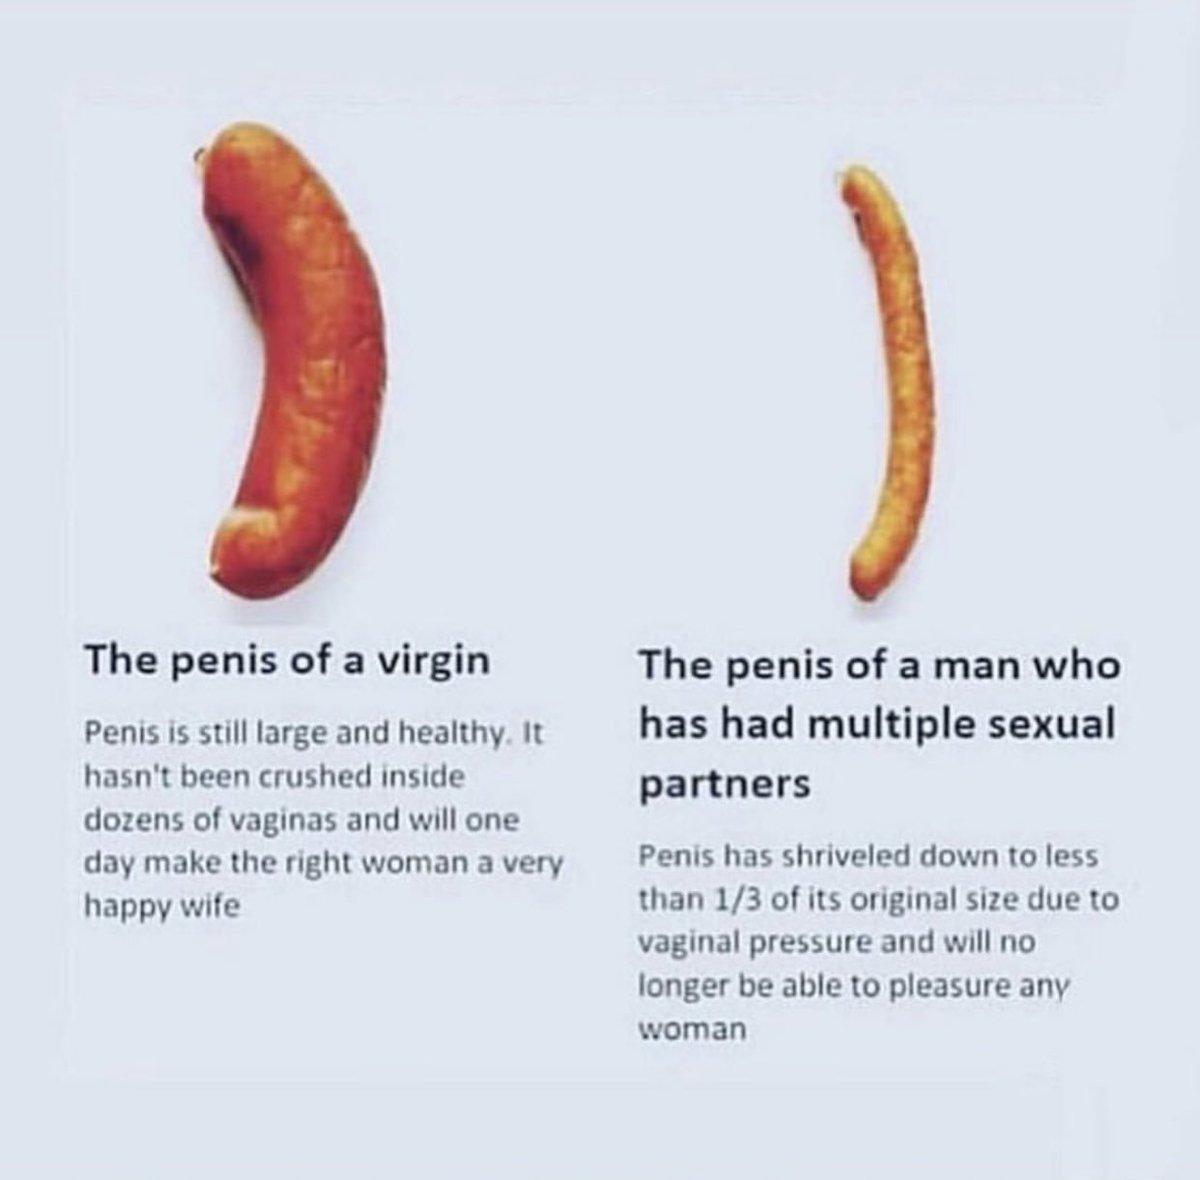 Fuck virginity